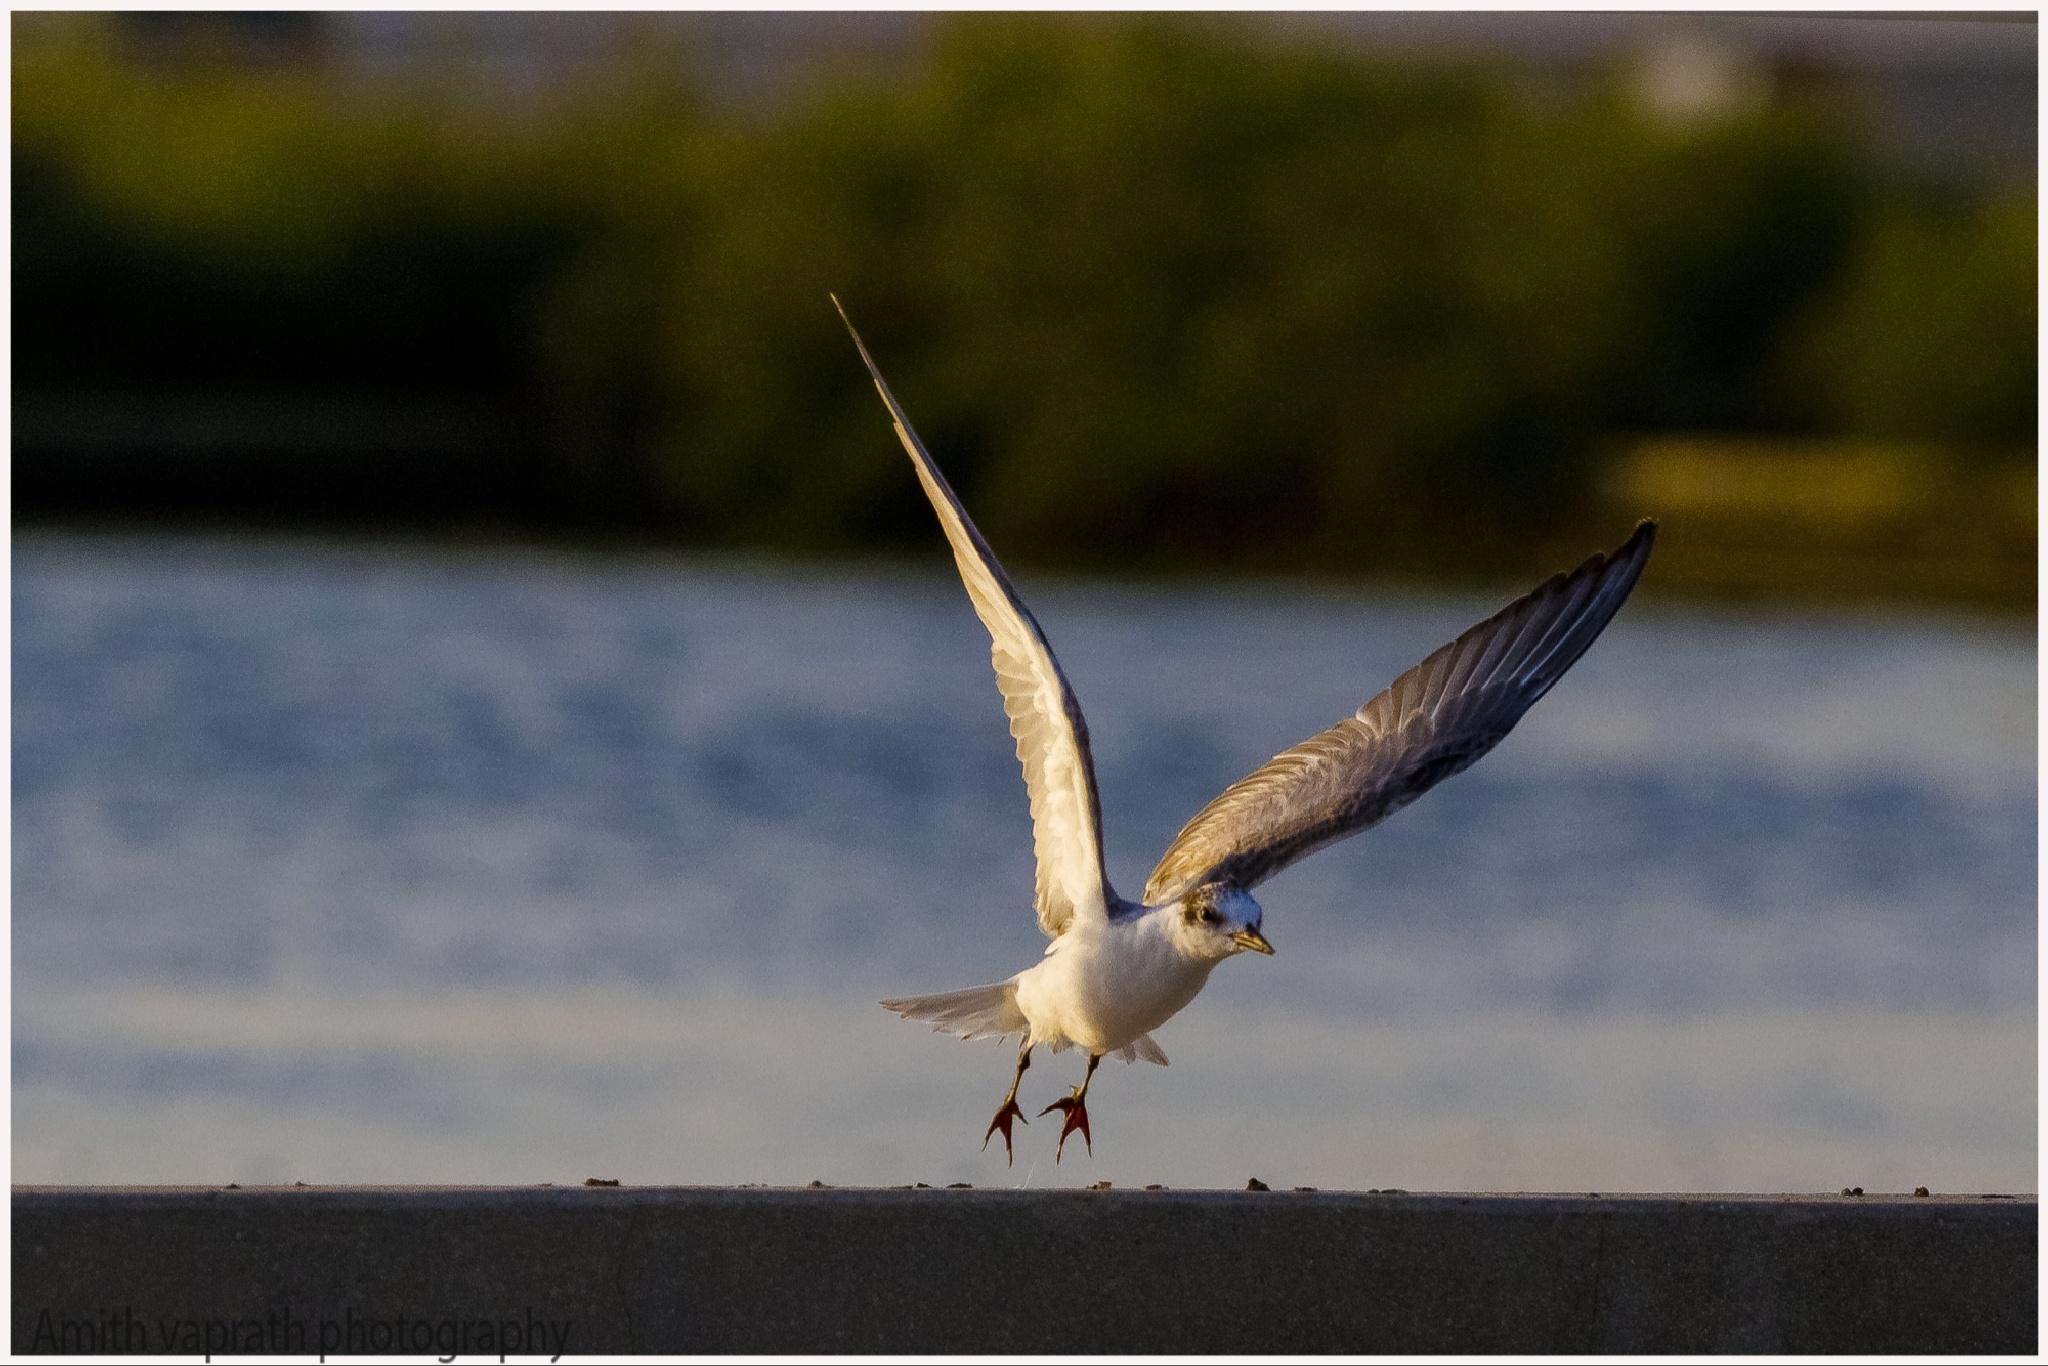 Take off by Amith Vaprath